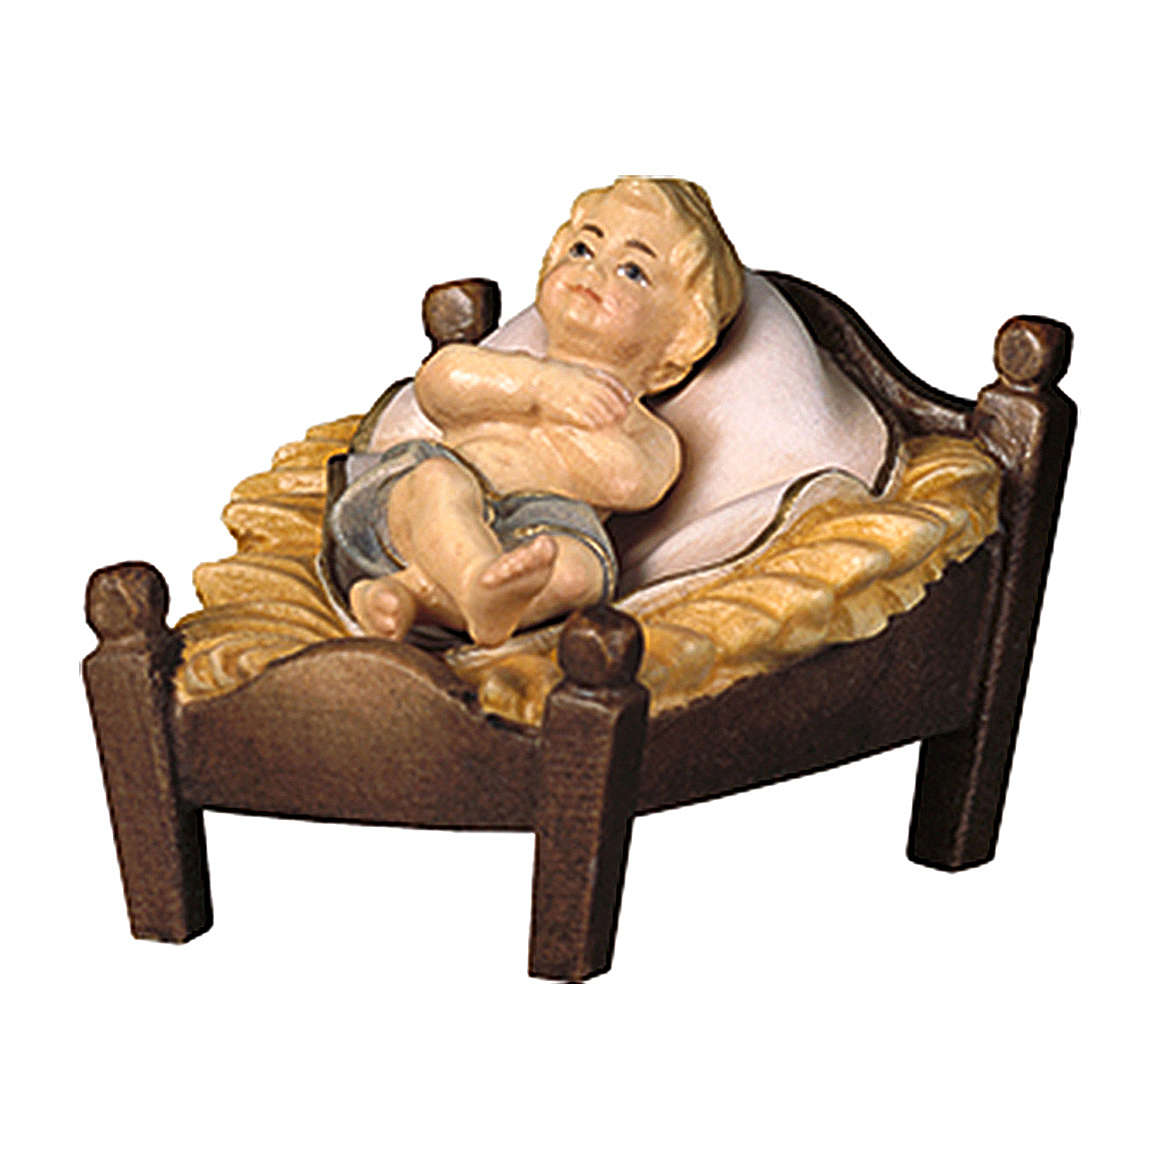 Gesù bambino con culla per presepe Original Pastore legno dipinto in Valgardena 10 cm 4